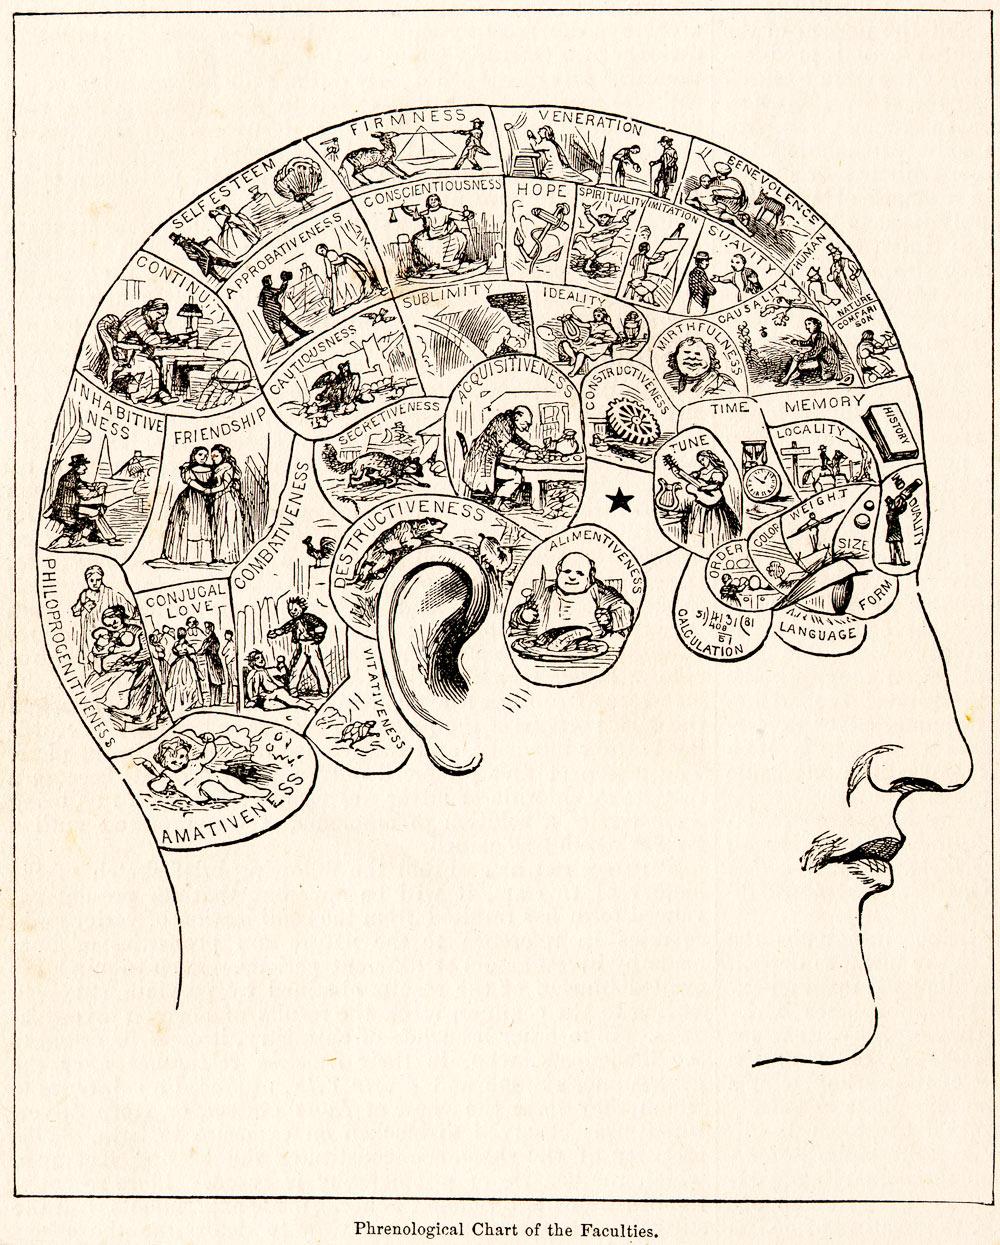 Phrenologist's chart